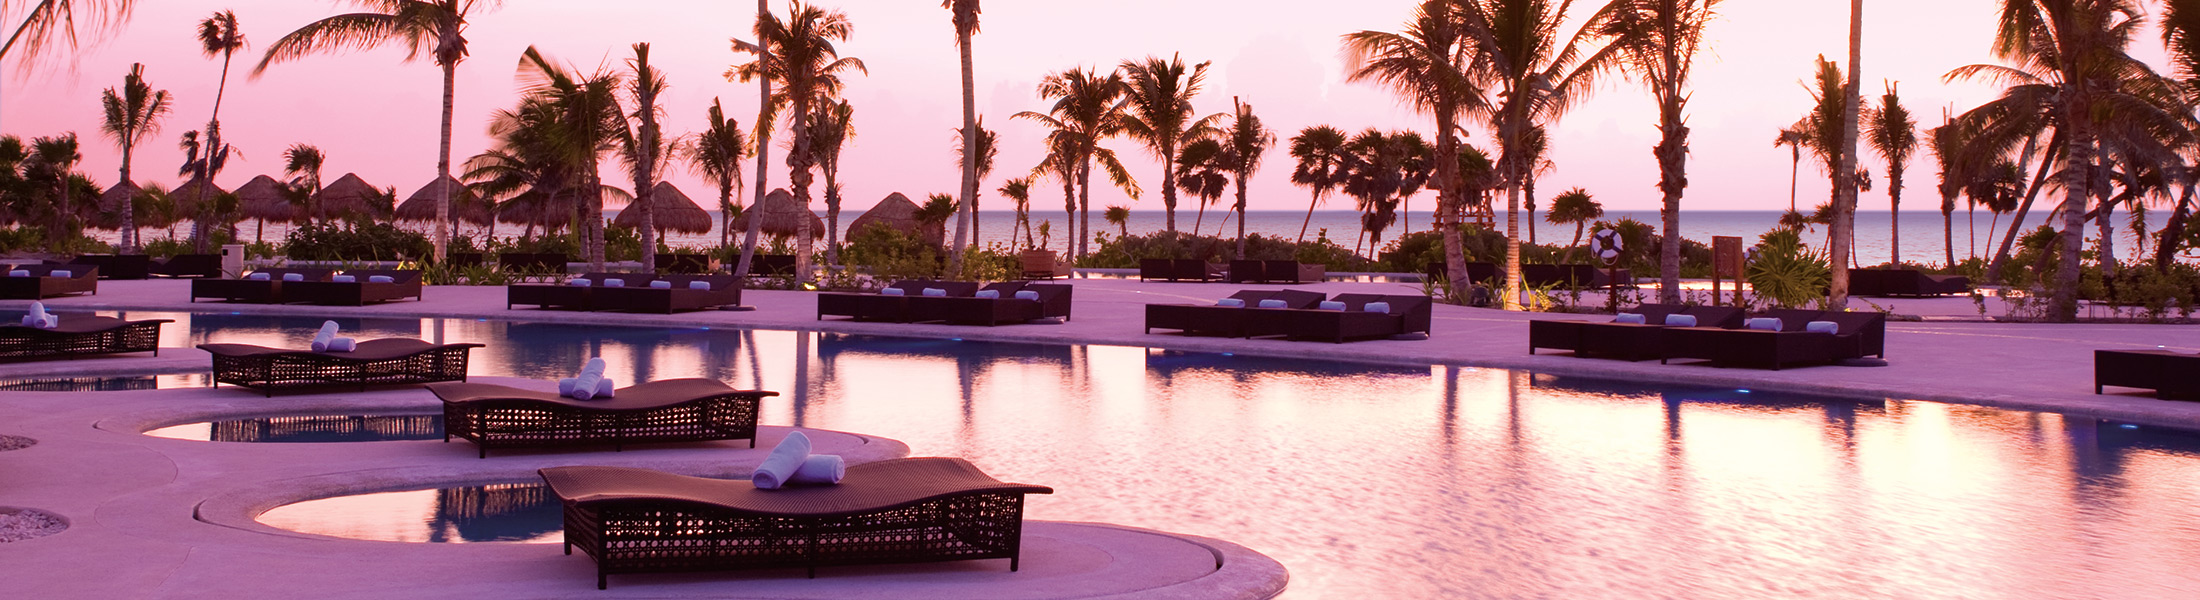 Sunrise over the infinity pool at Secrets Maroma Beach Riviera